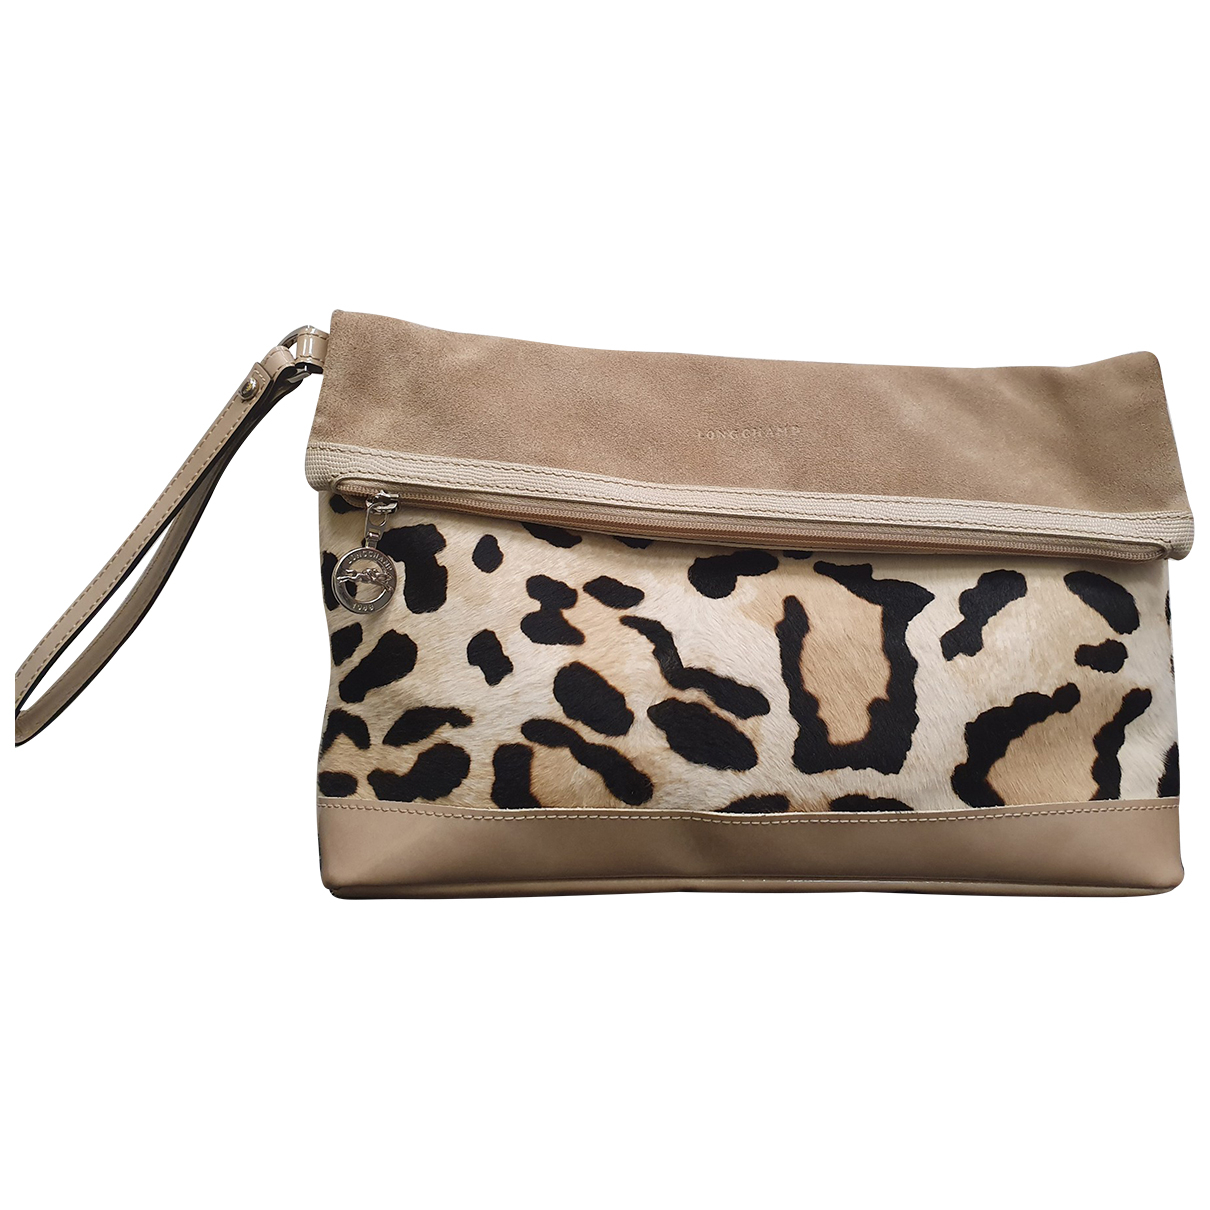 Longchamp \N Beige Leather Clutch bag for Women \N